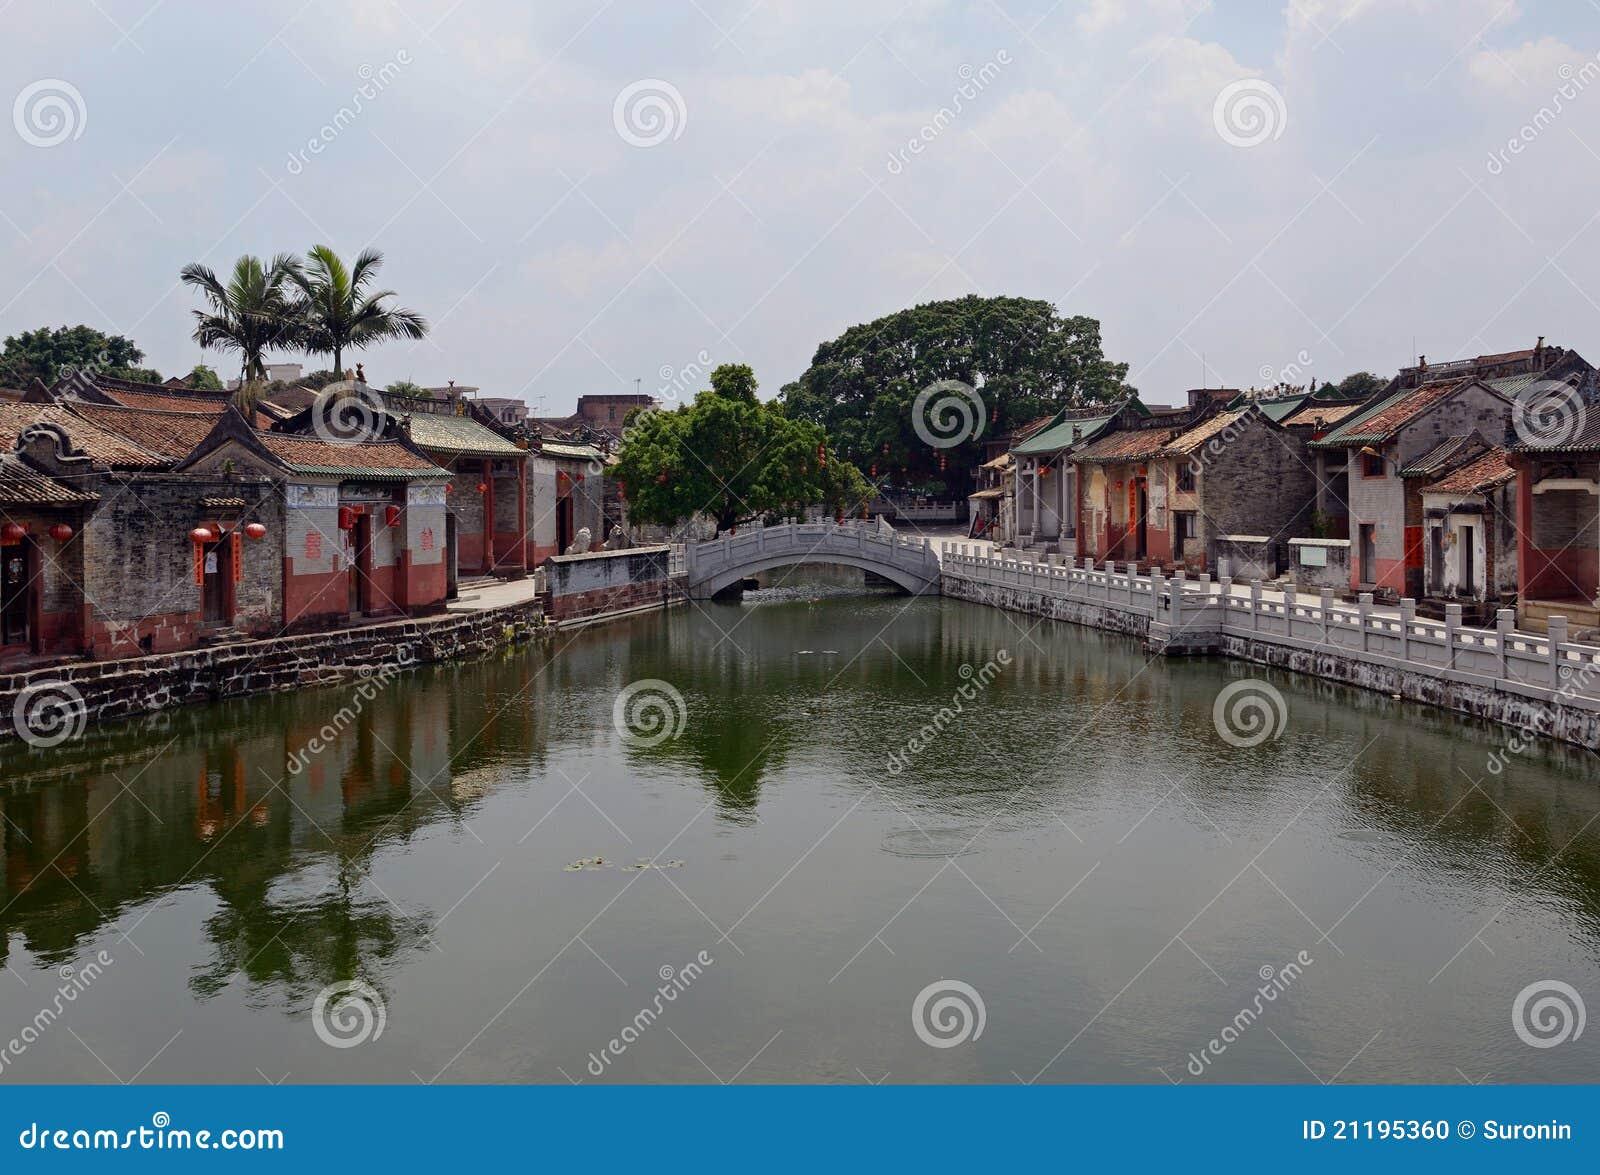 Nanshe Ancient Village